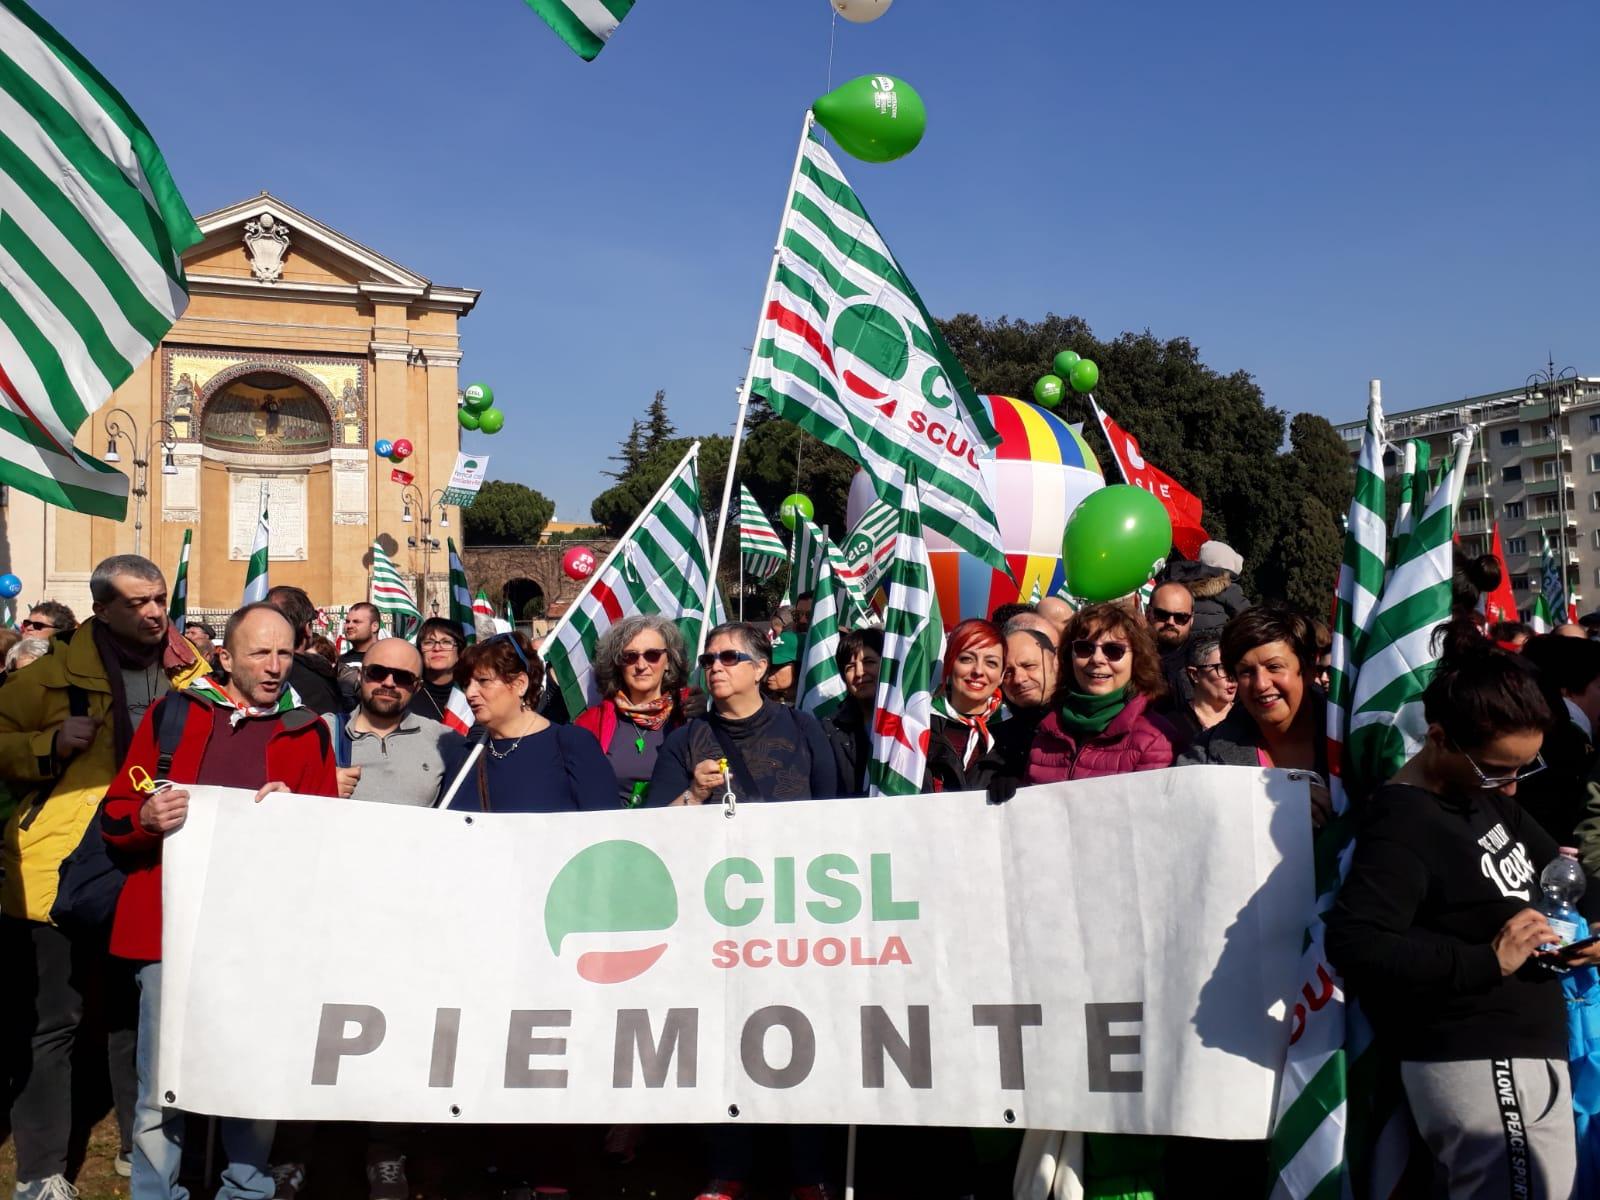 Cisl Scuola Piemonte